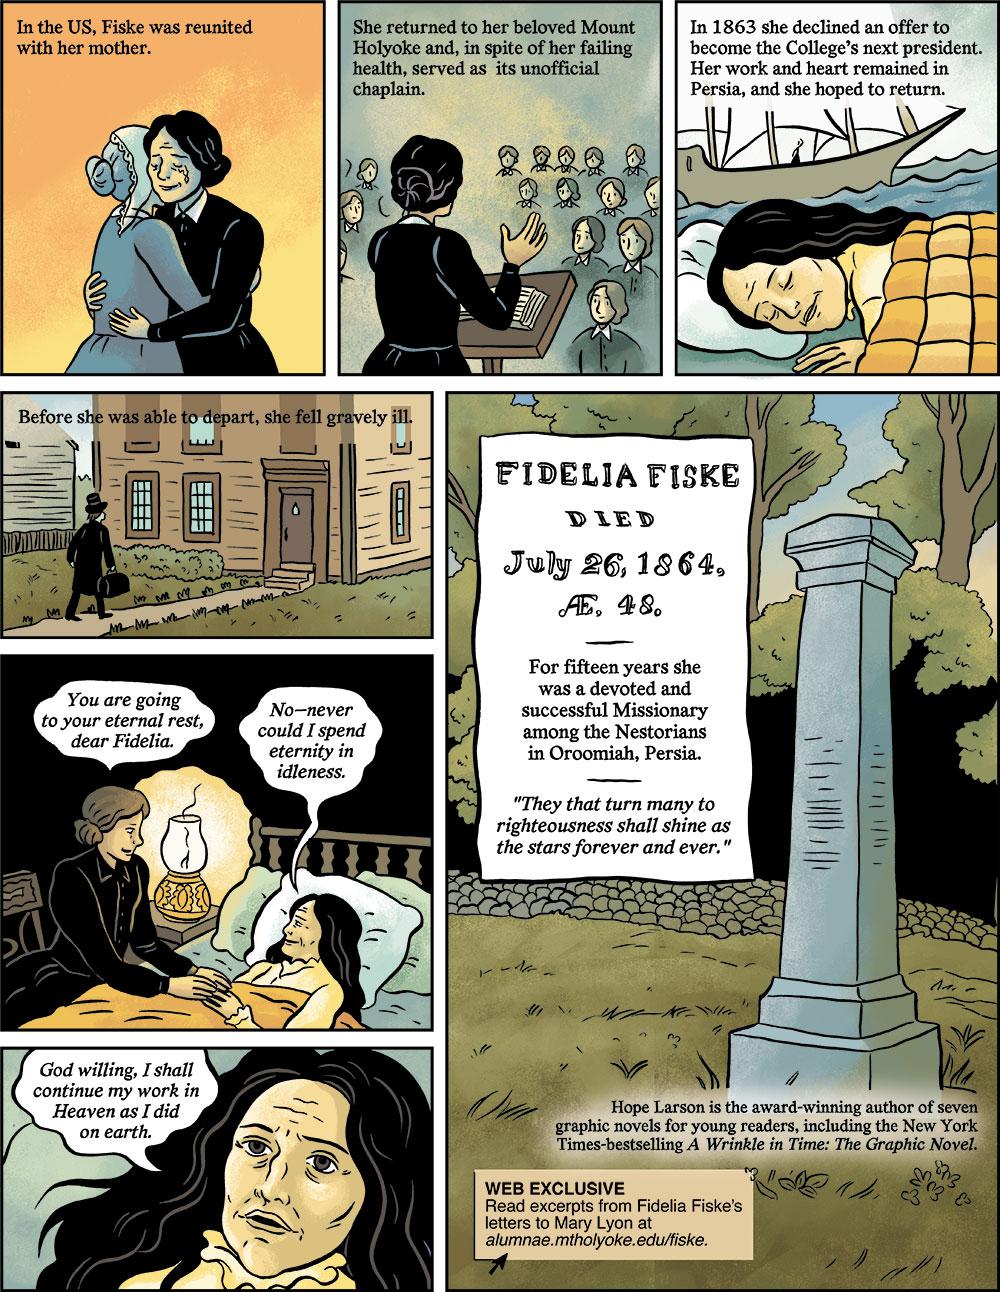 Fidelia Fiske